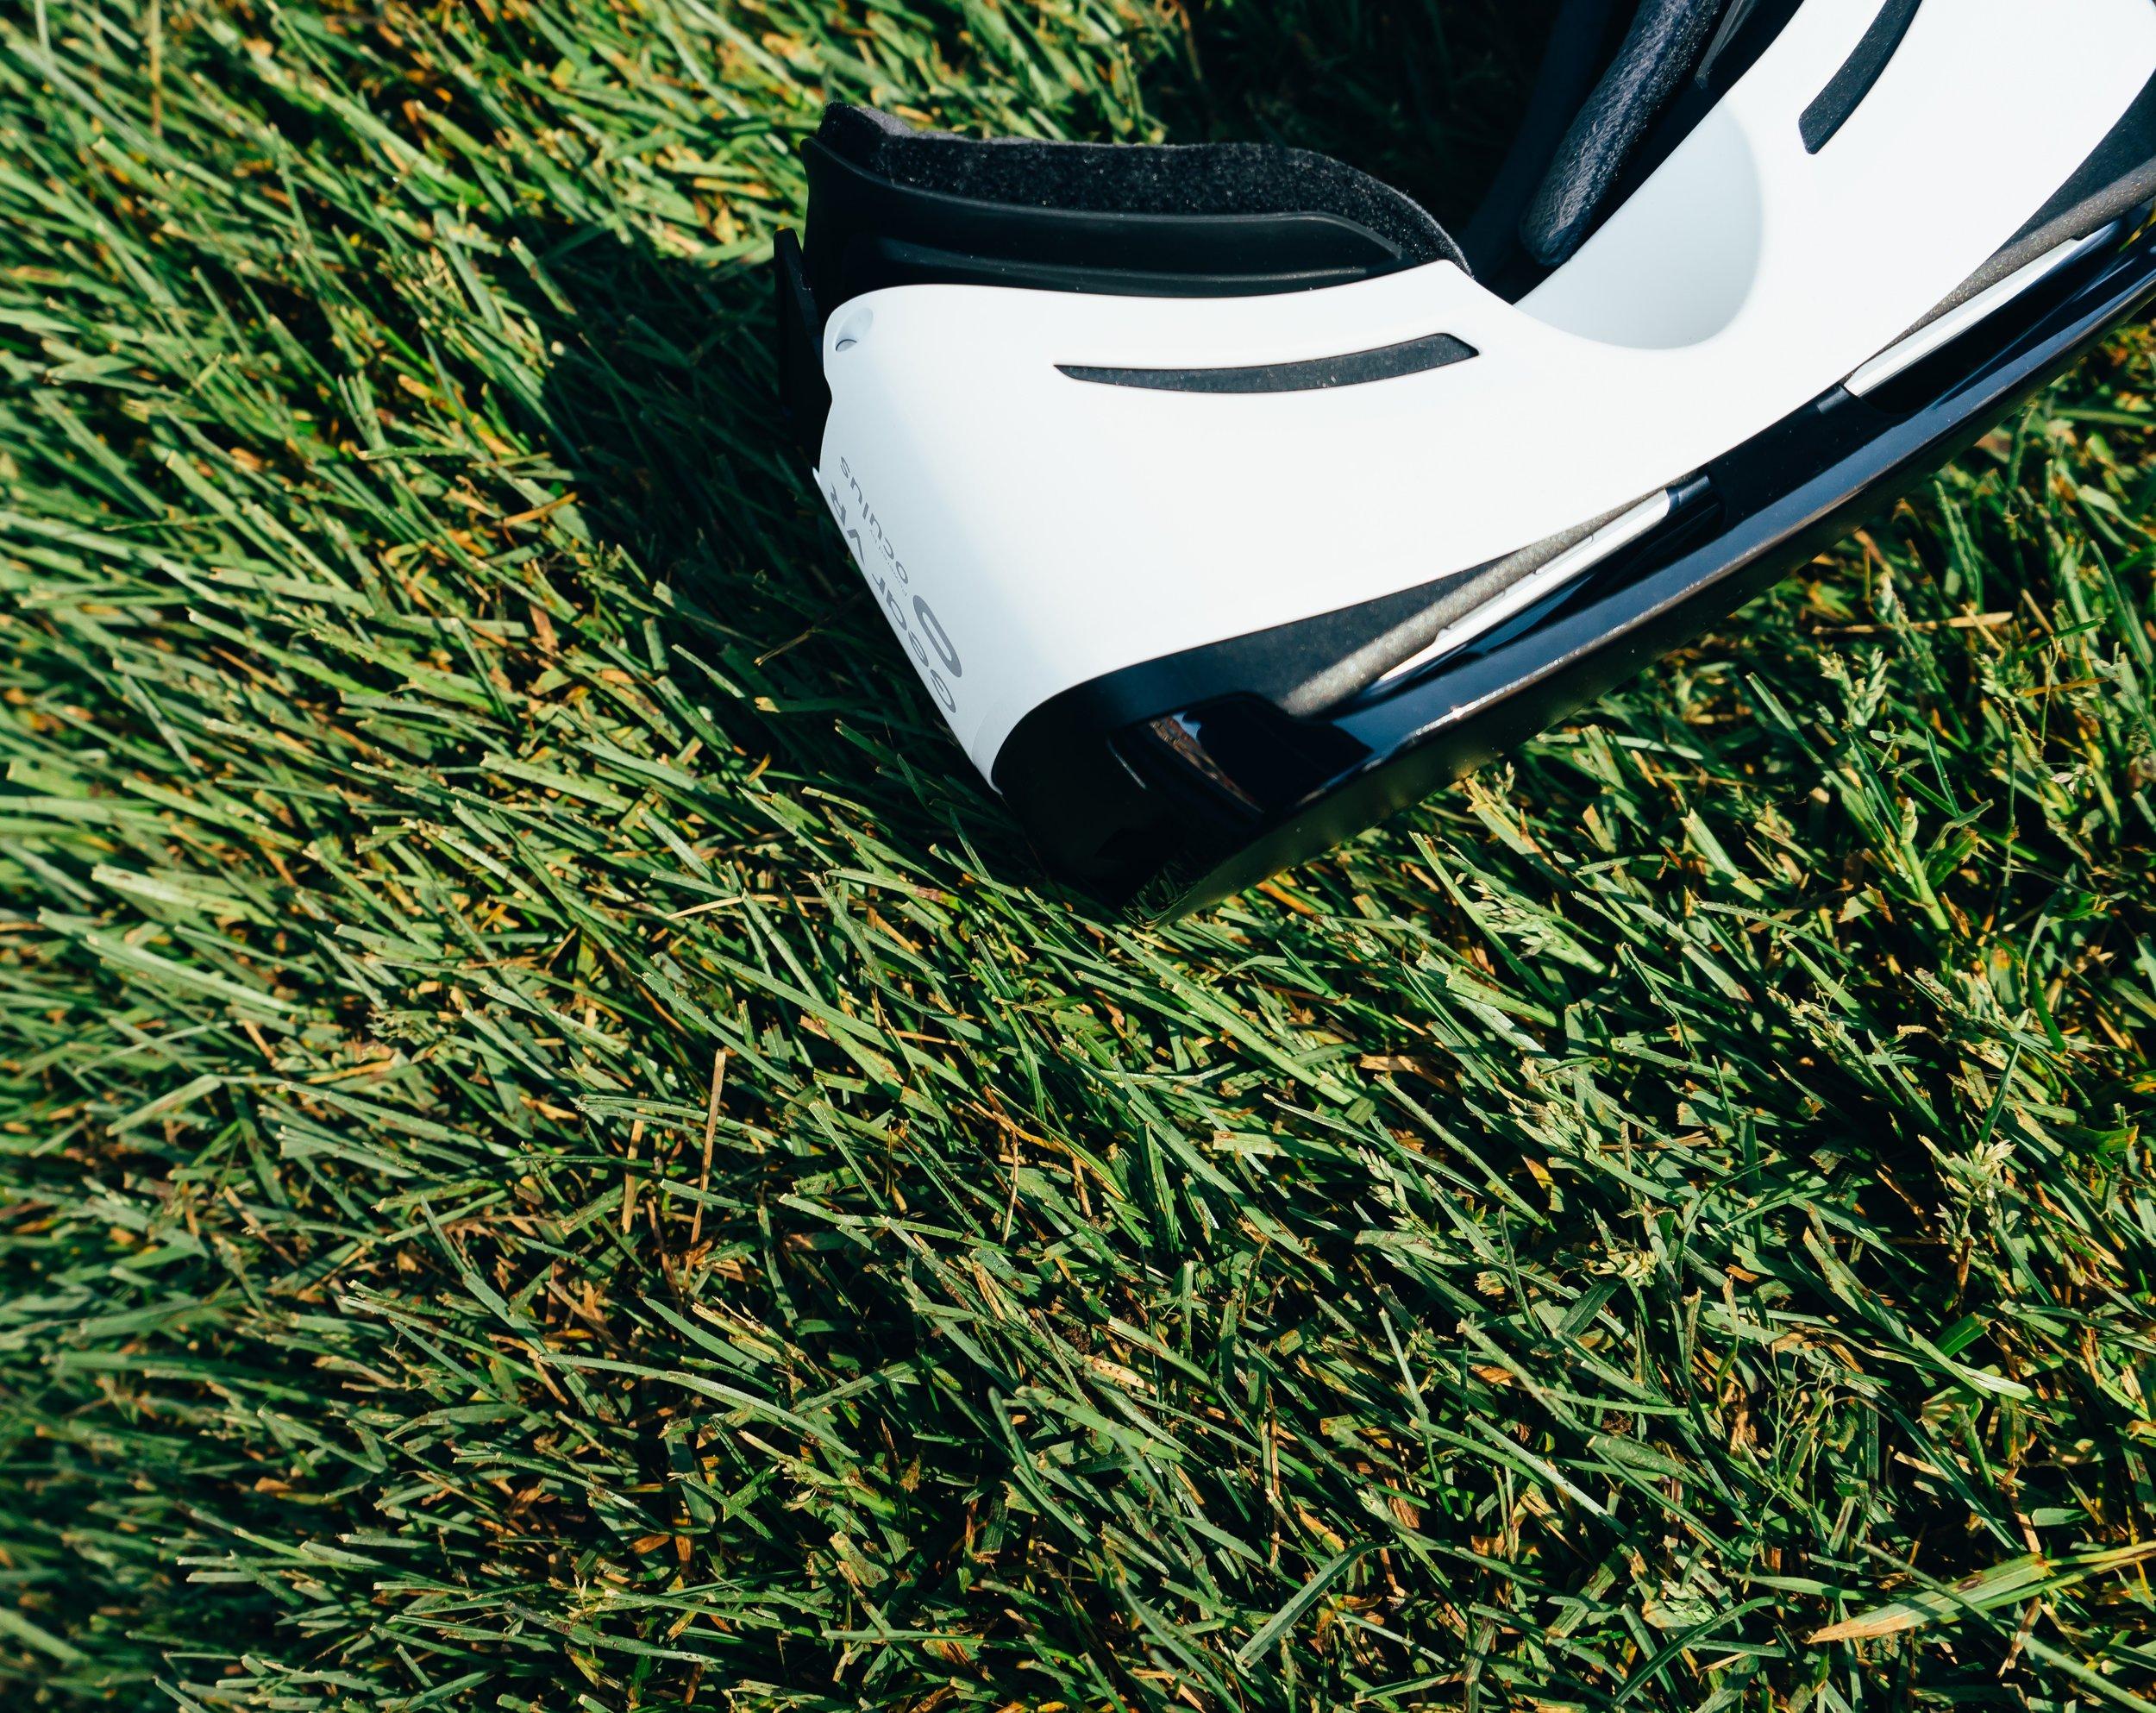 electronics-grass-lawn-532559.jpg